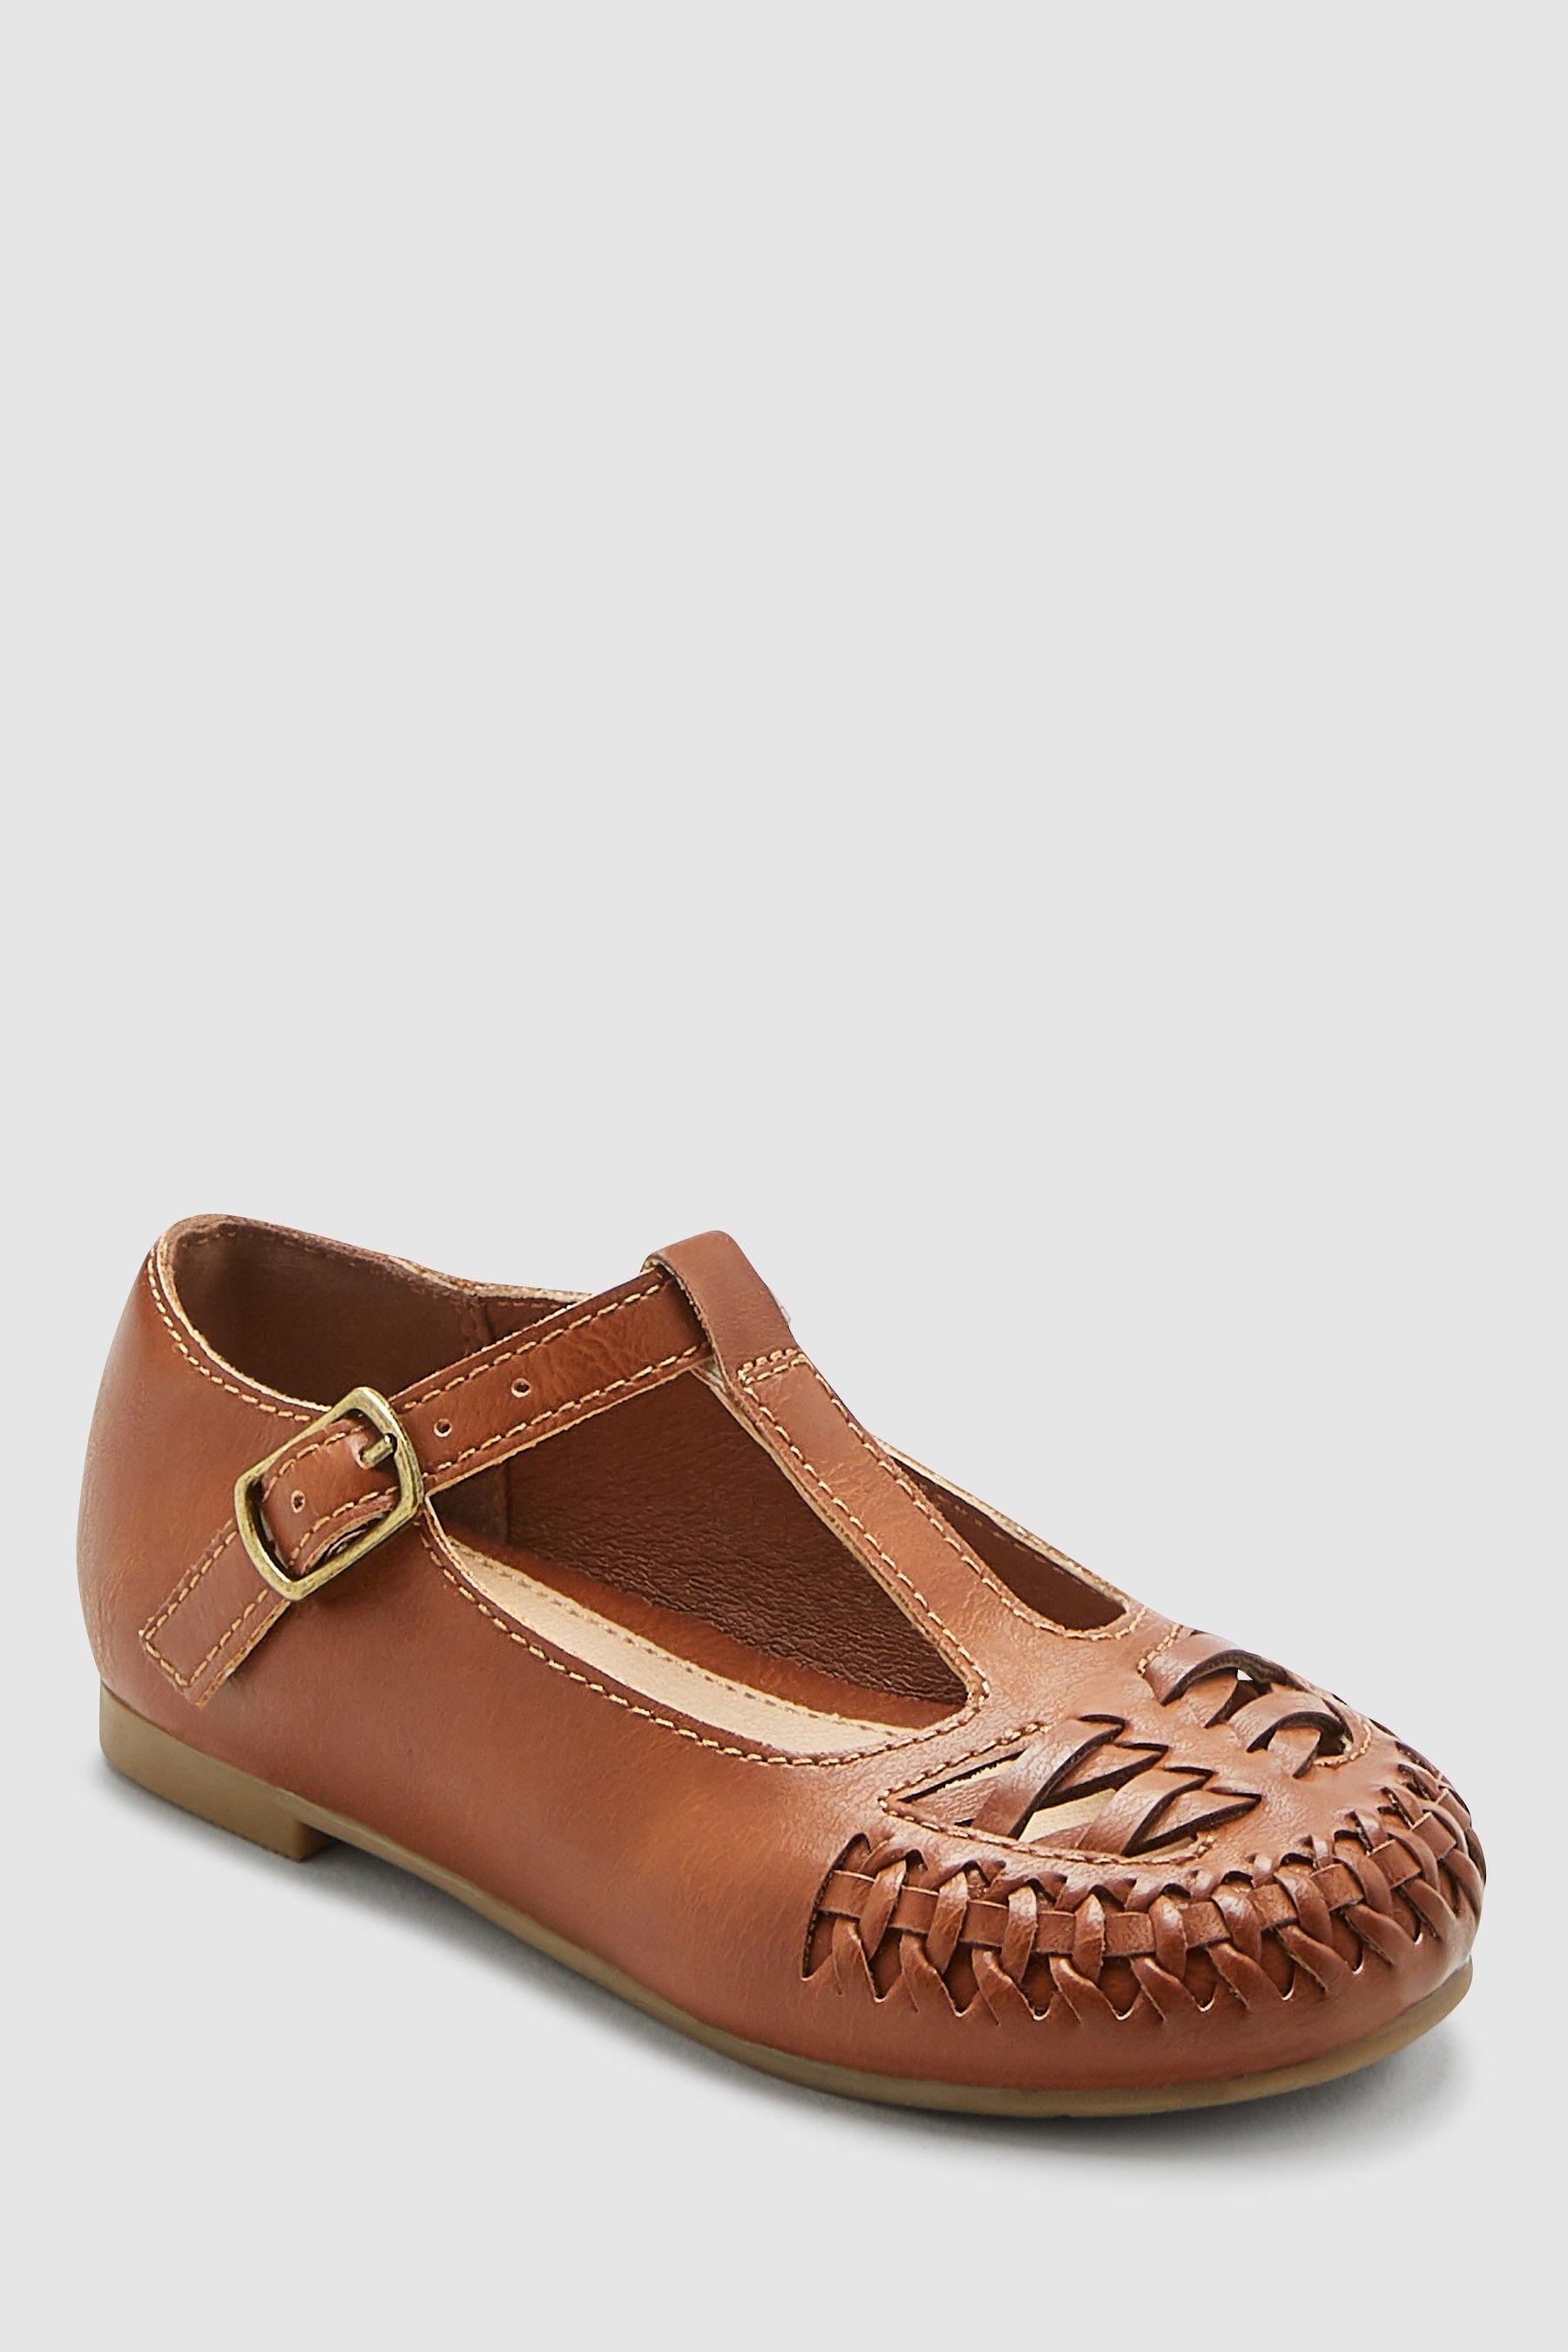 girls shoes next